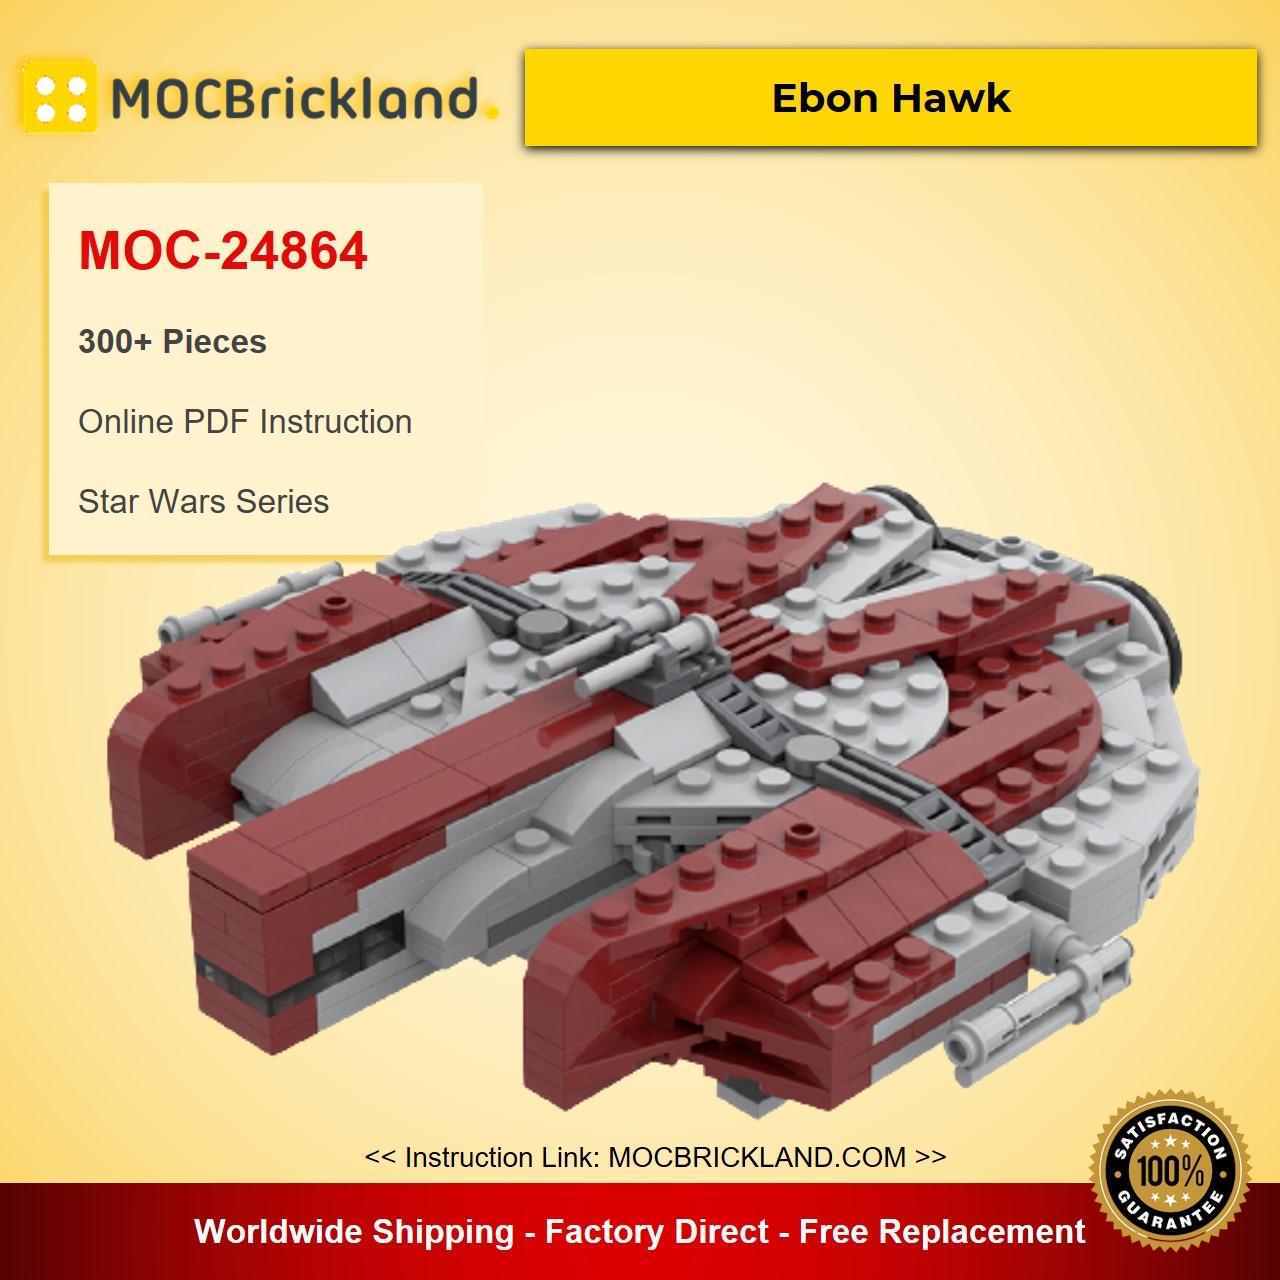 Ebon Hawk MOC-24864 Star Wars Designed By Brix23 With 300 Pieces